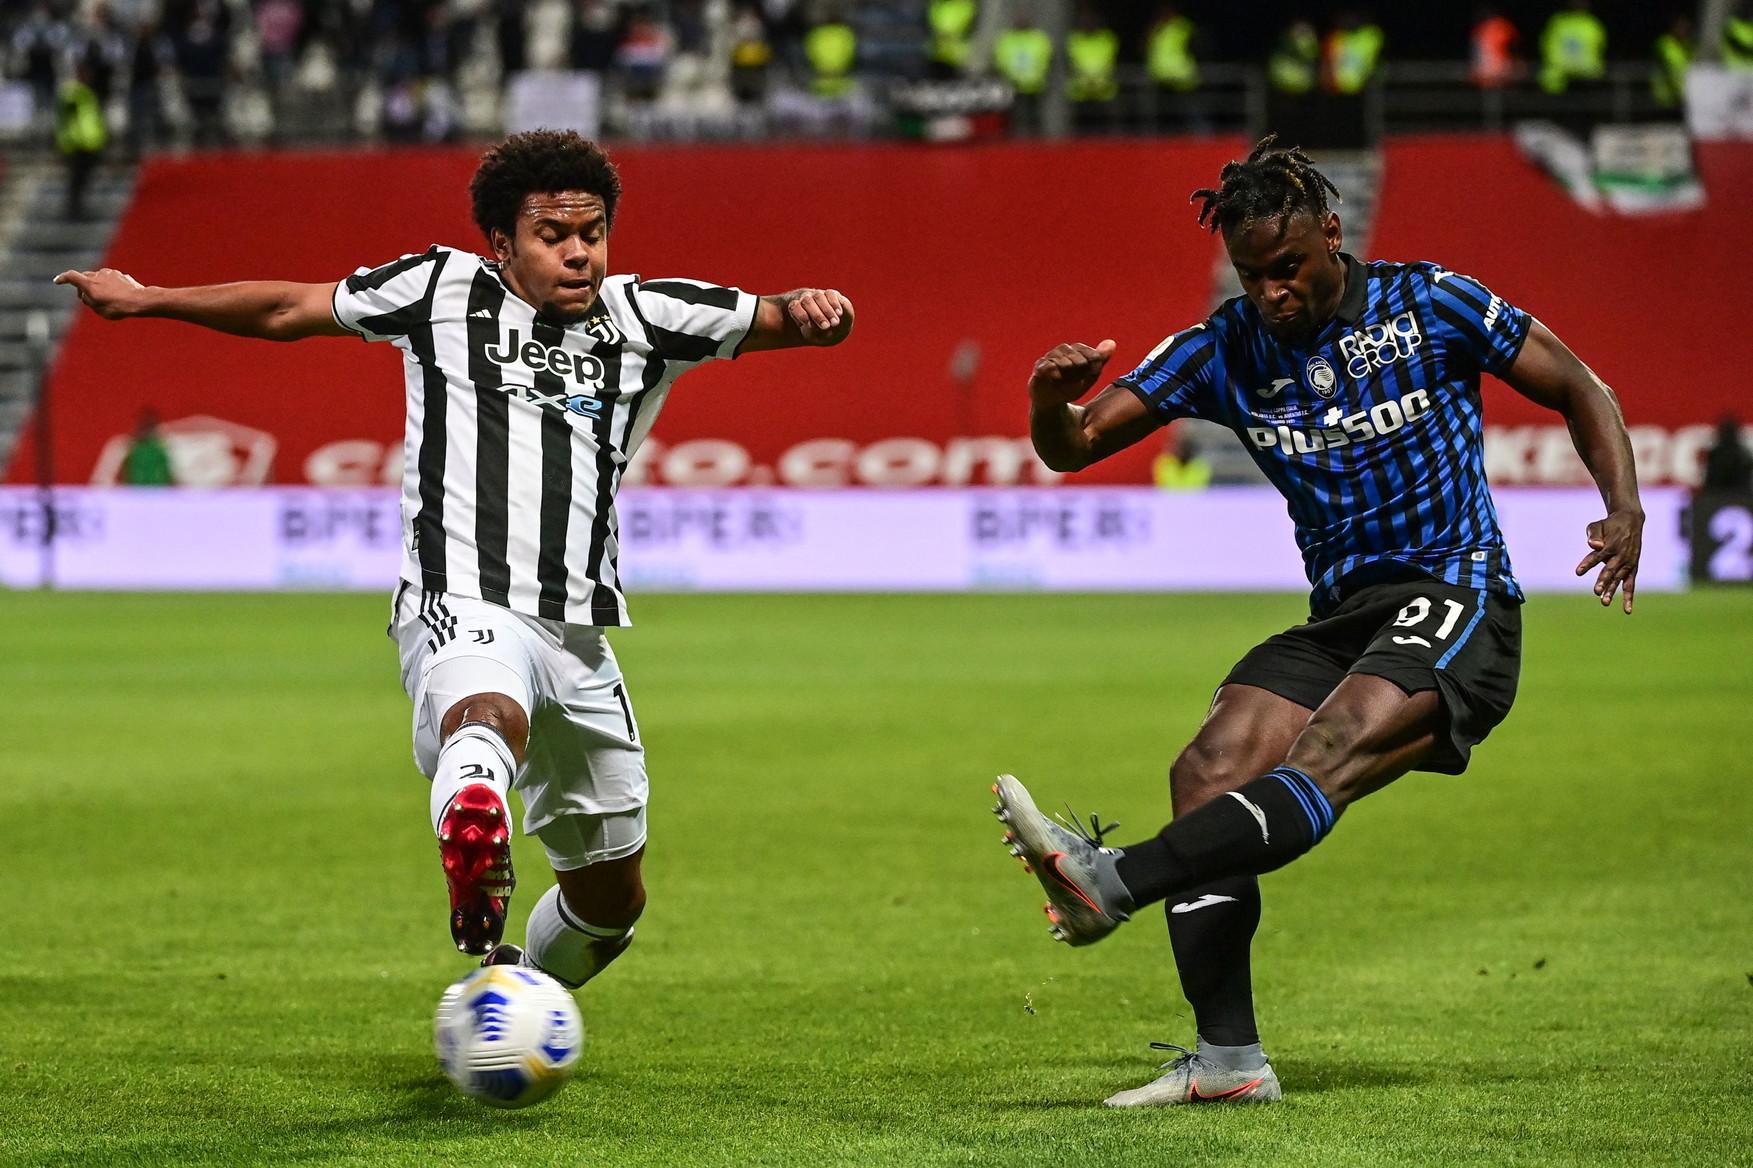 Coppa Italia, Atalanta-Juventus 1-2: quattordicesimo titolo per i  bianconeri | News - Sportmediaset